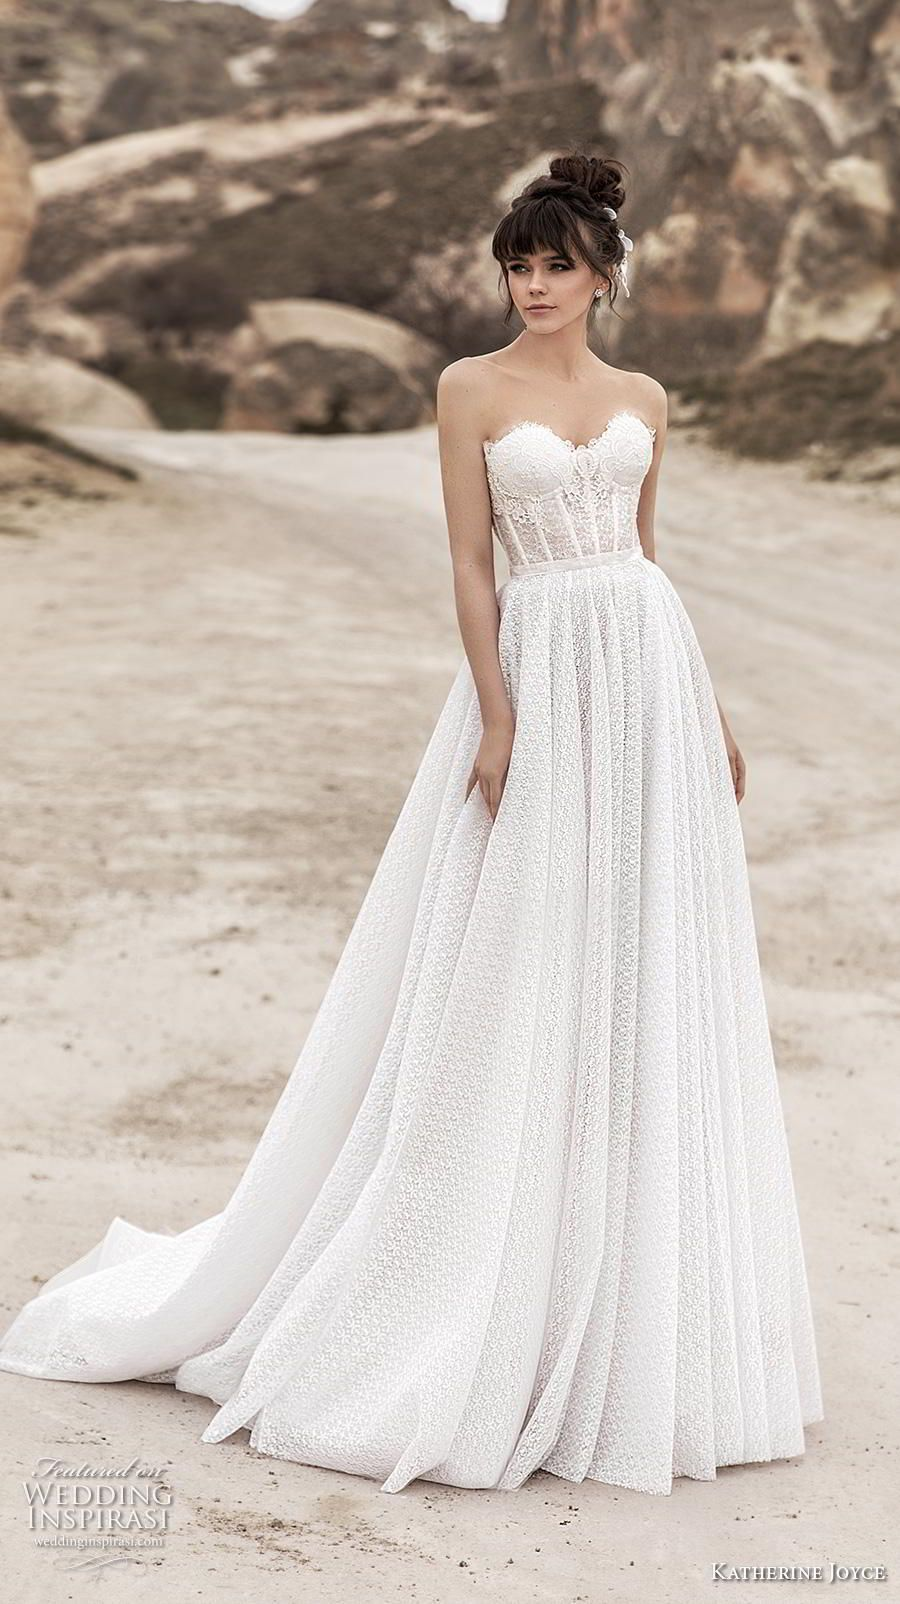 katherine joyce 2020 bridal strapless sweetheart neckline